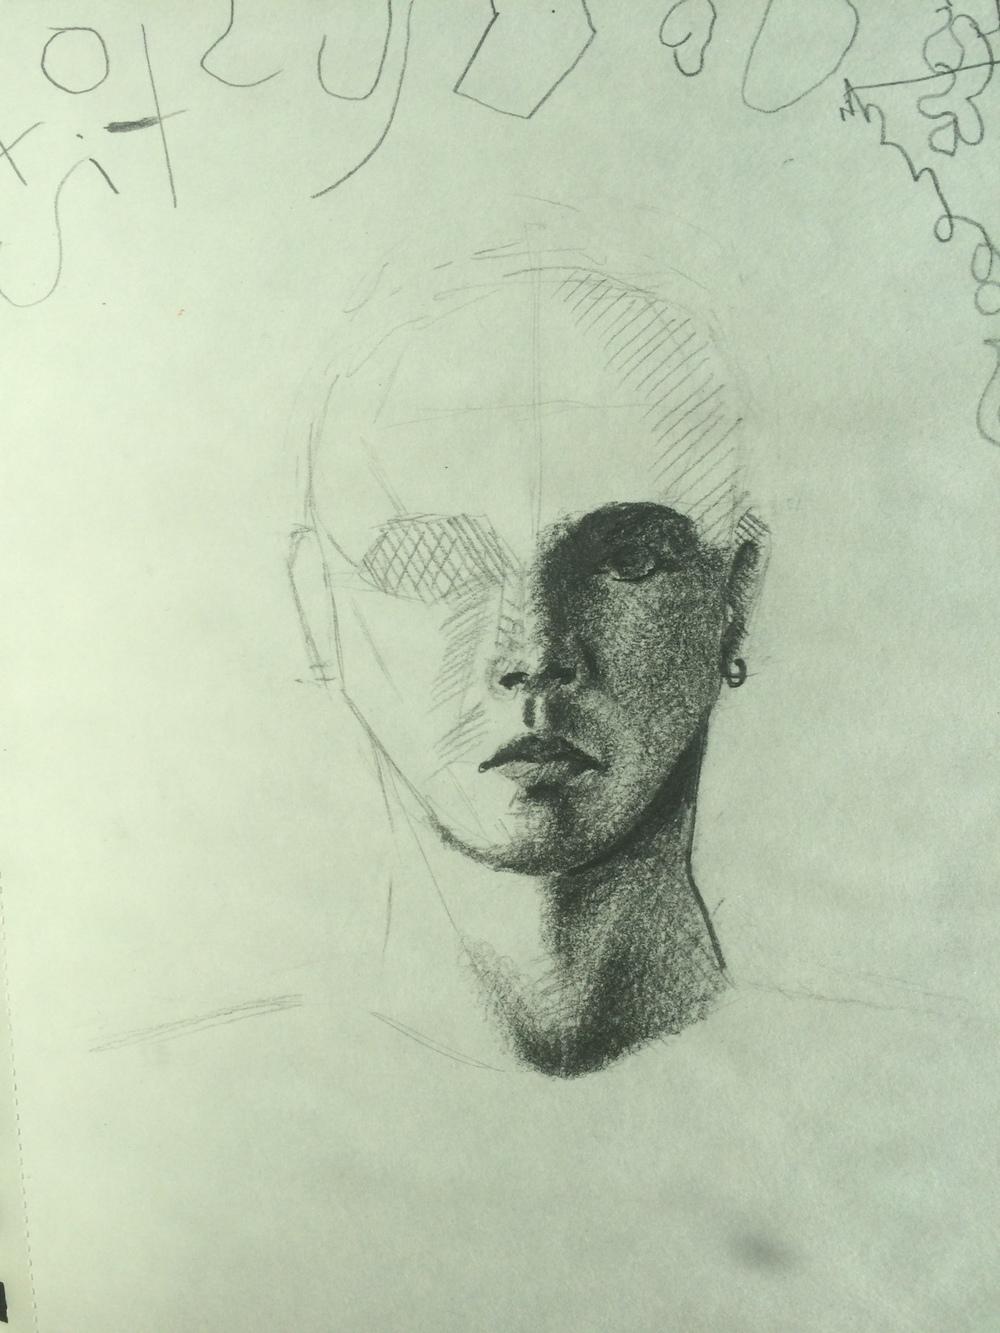 20 Minute Sketch 2/25/15